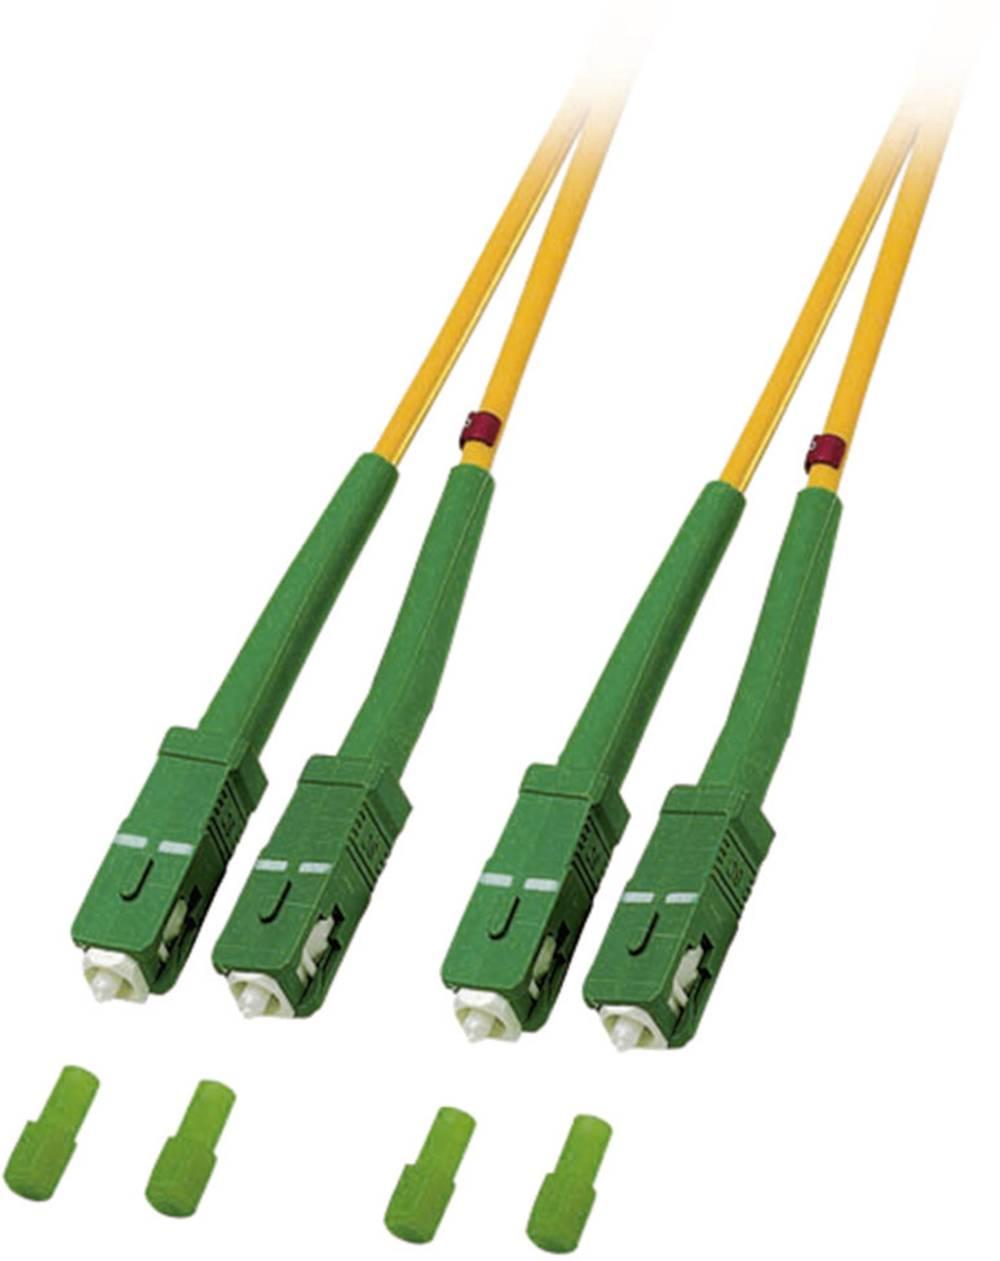 Optični priključni kabel [1x SC/APC 8° vtič - 1x SC/APC 8° vtič] 9/125µ Singlemode OS2 5 m EFB Elektronik